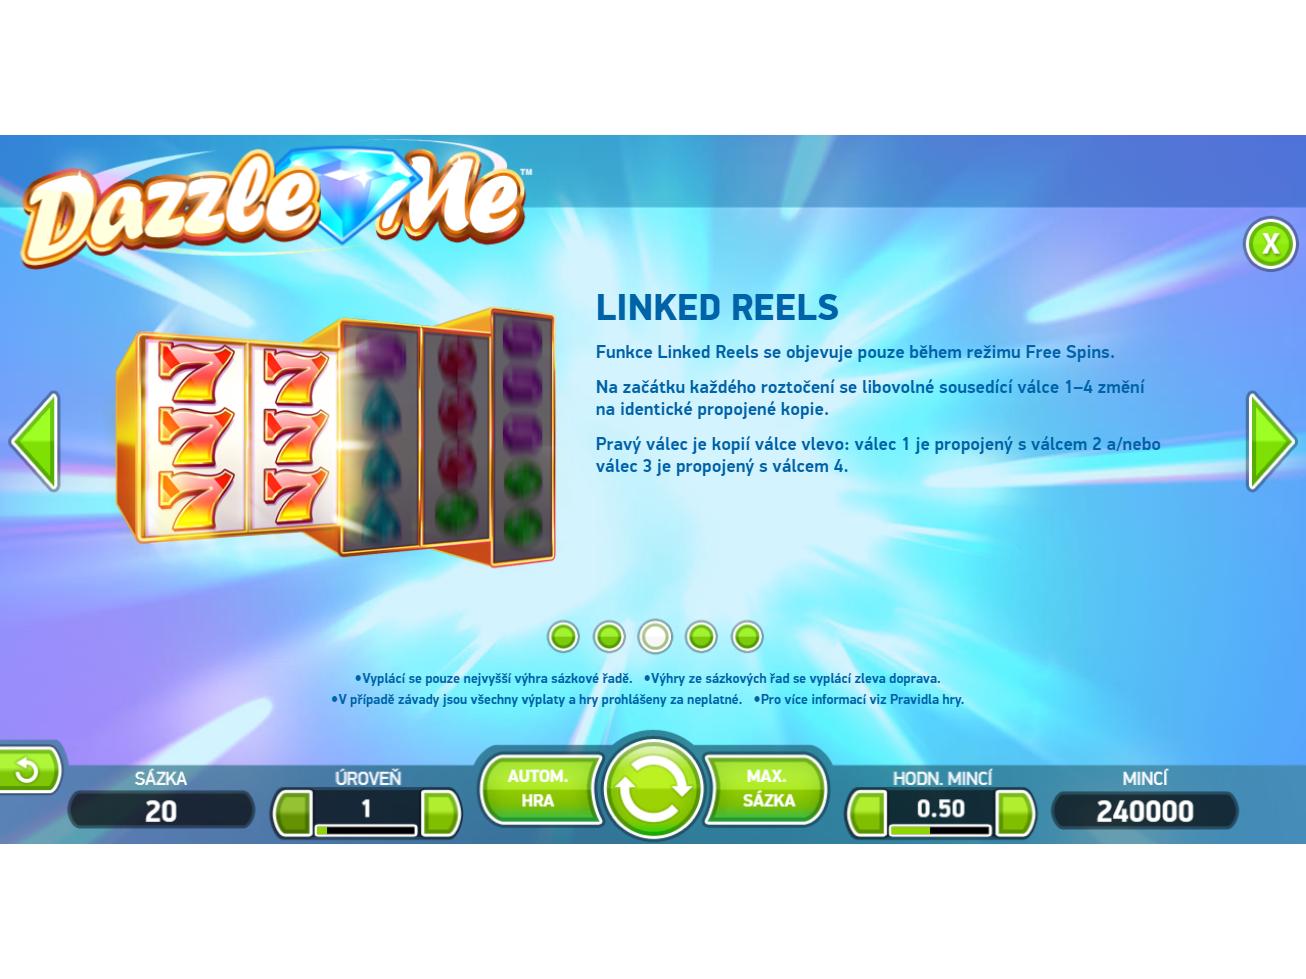 Dazzle Me online#